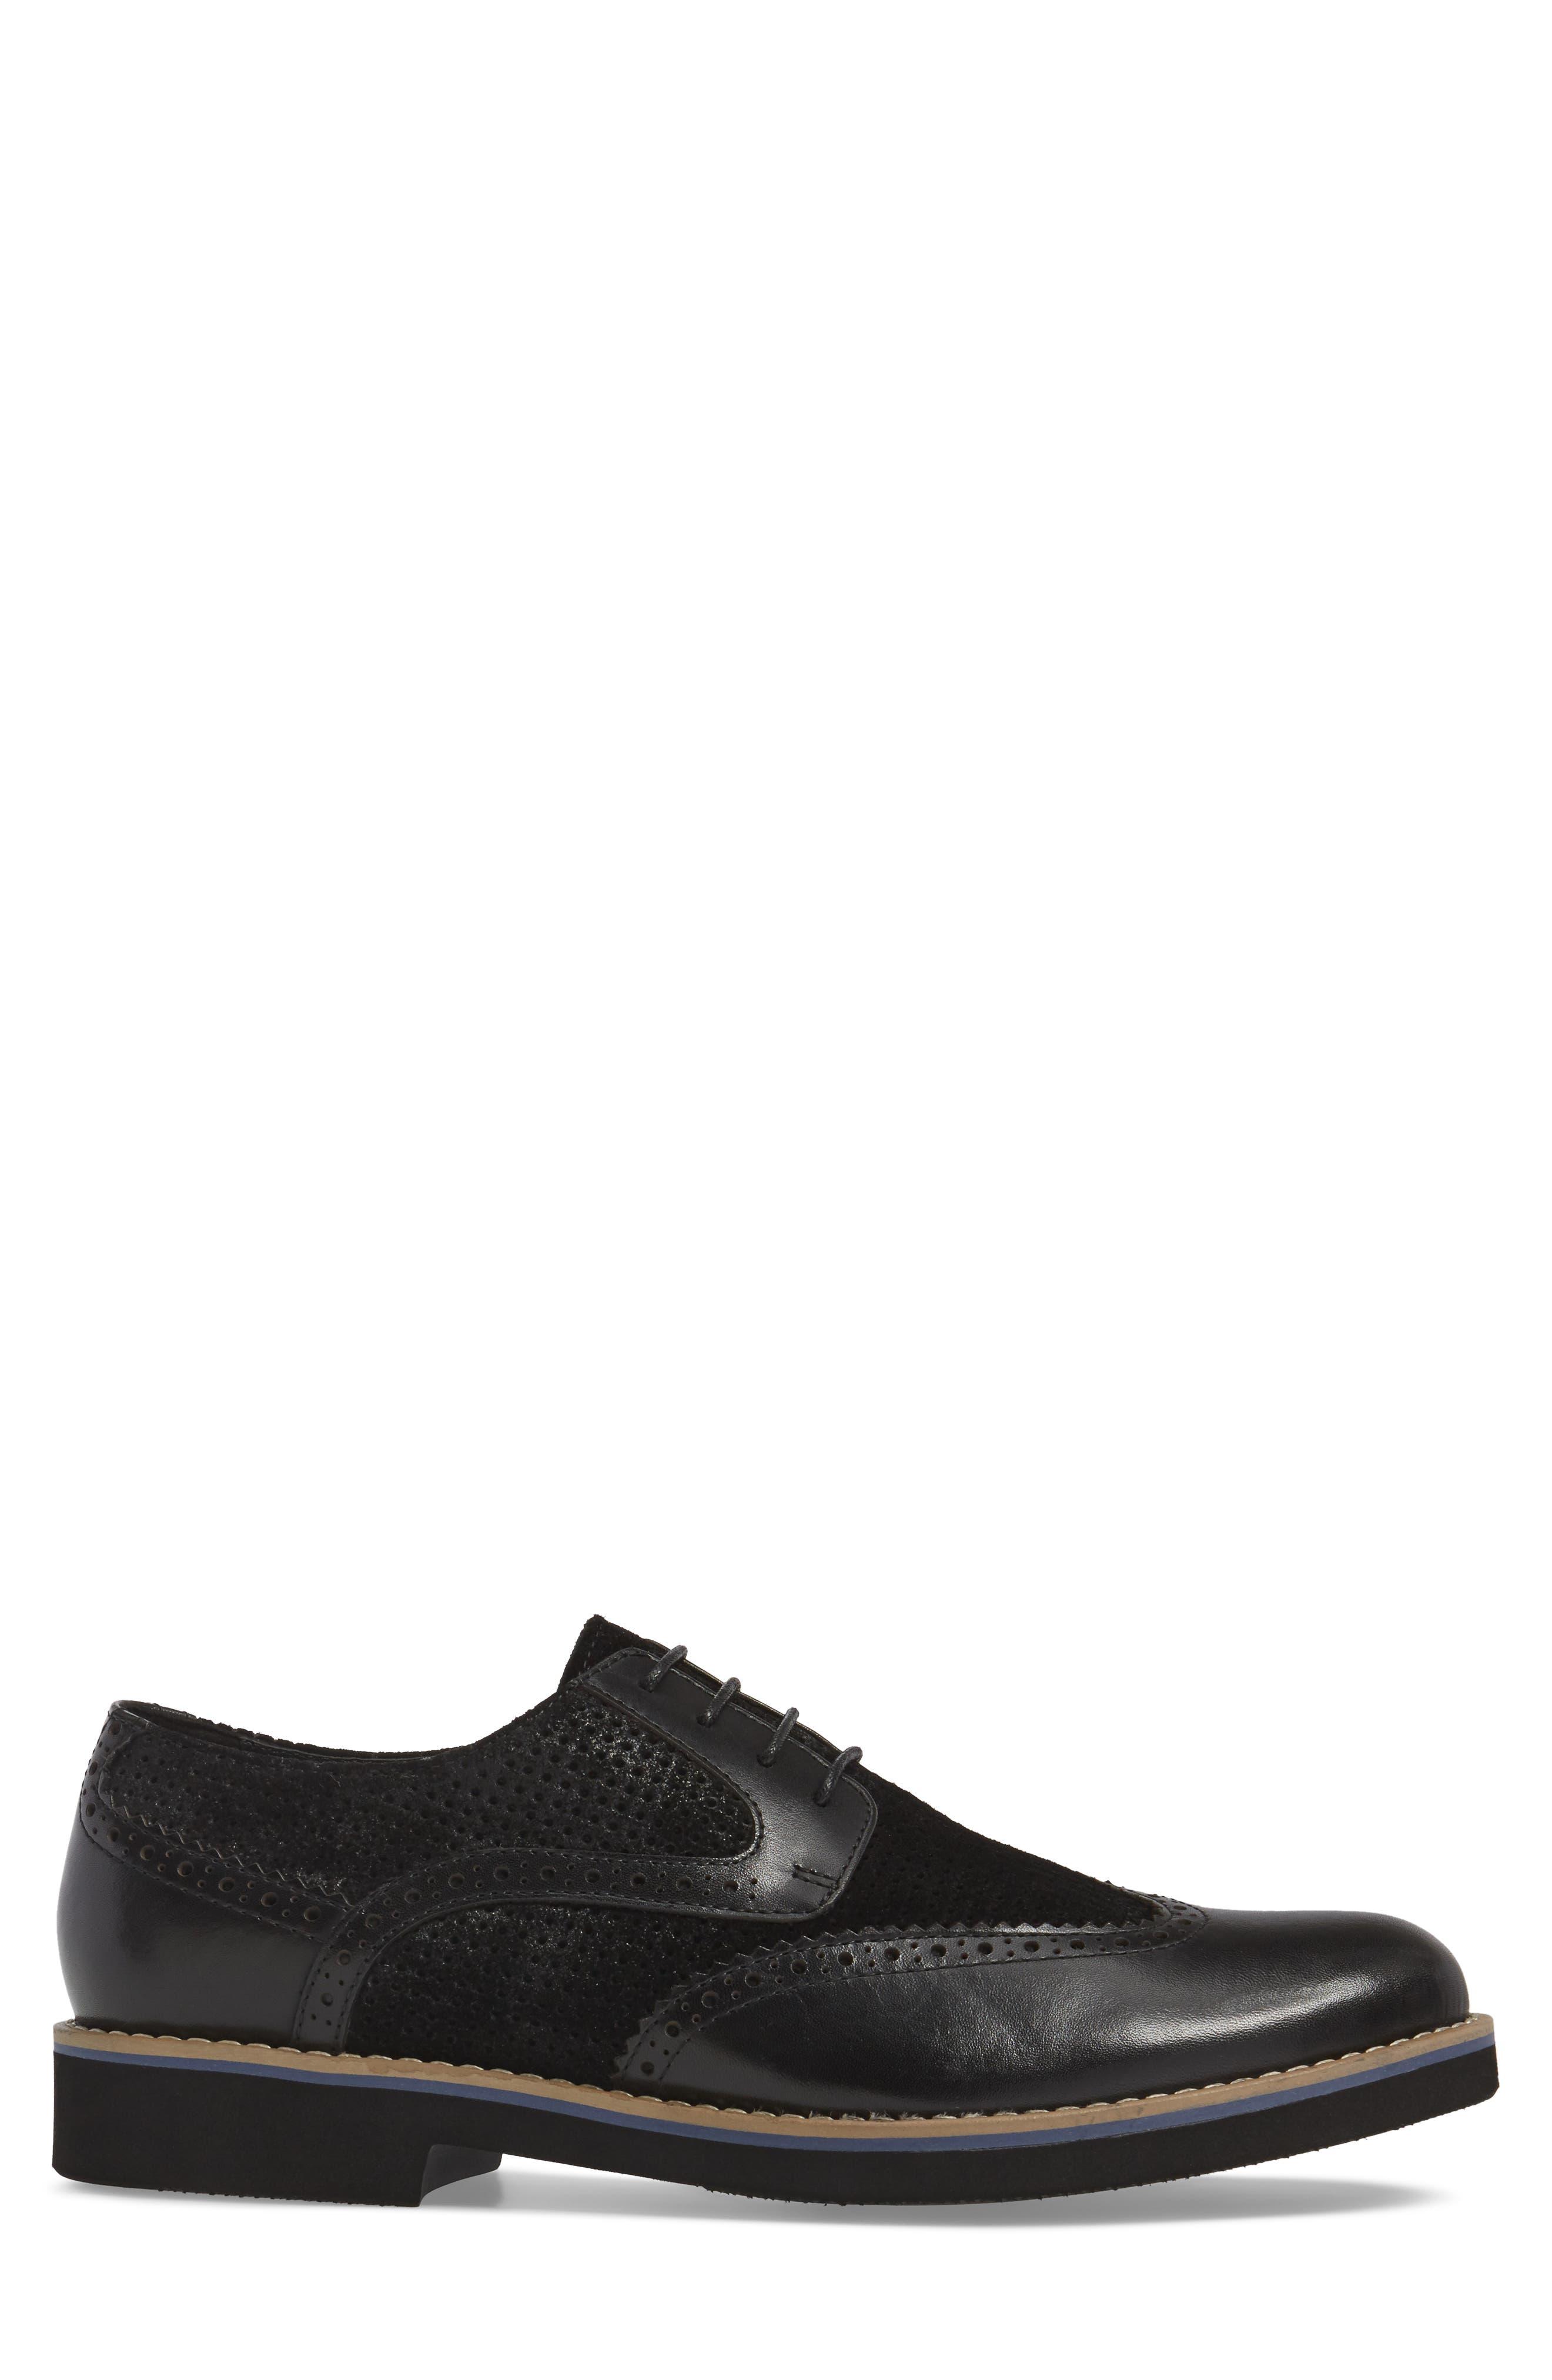 Maritime Spectator Shoe,                             Alternate thumbnail 3, color,                             Black Leather